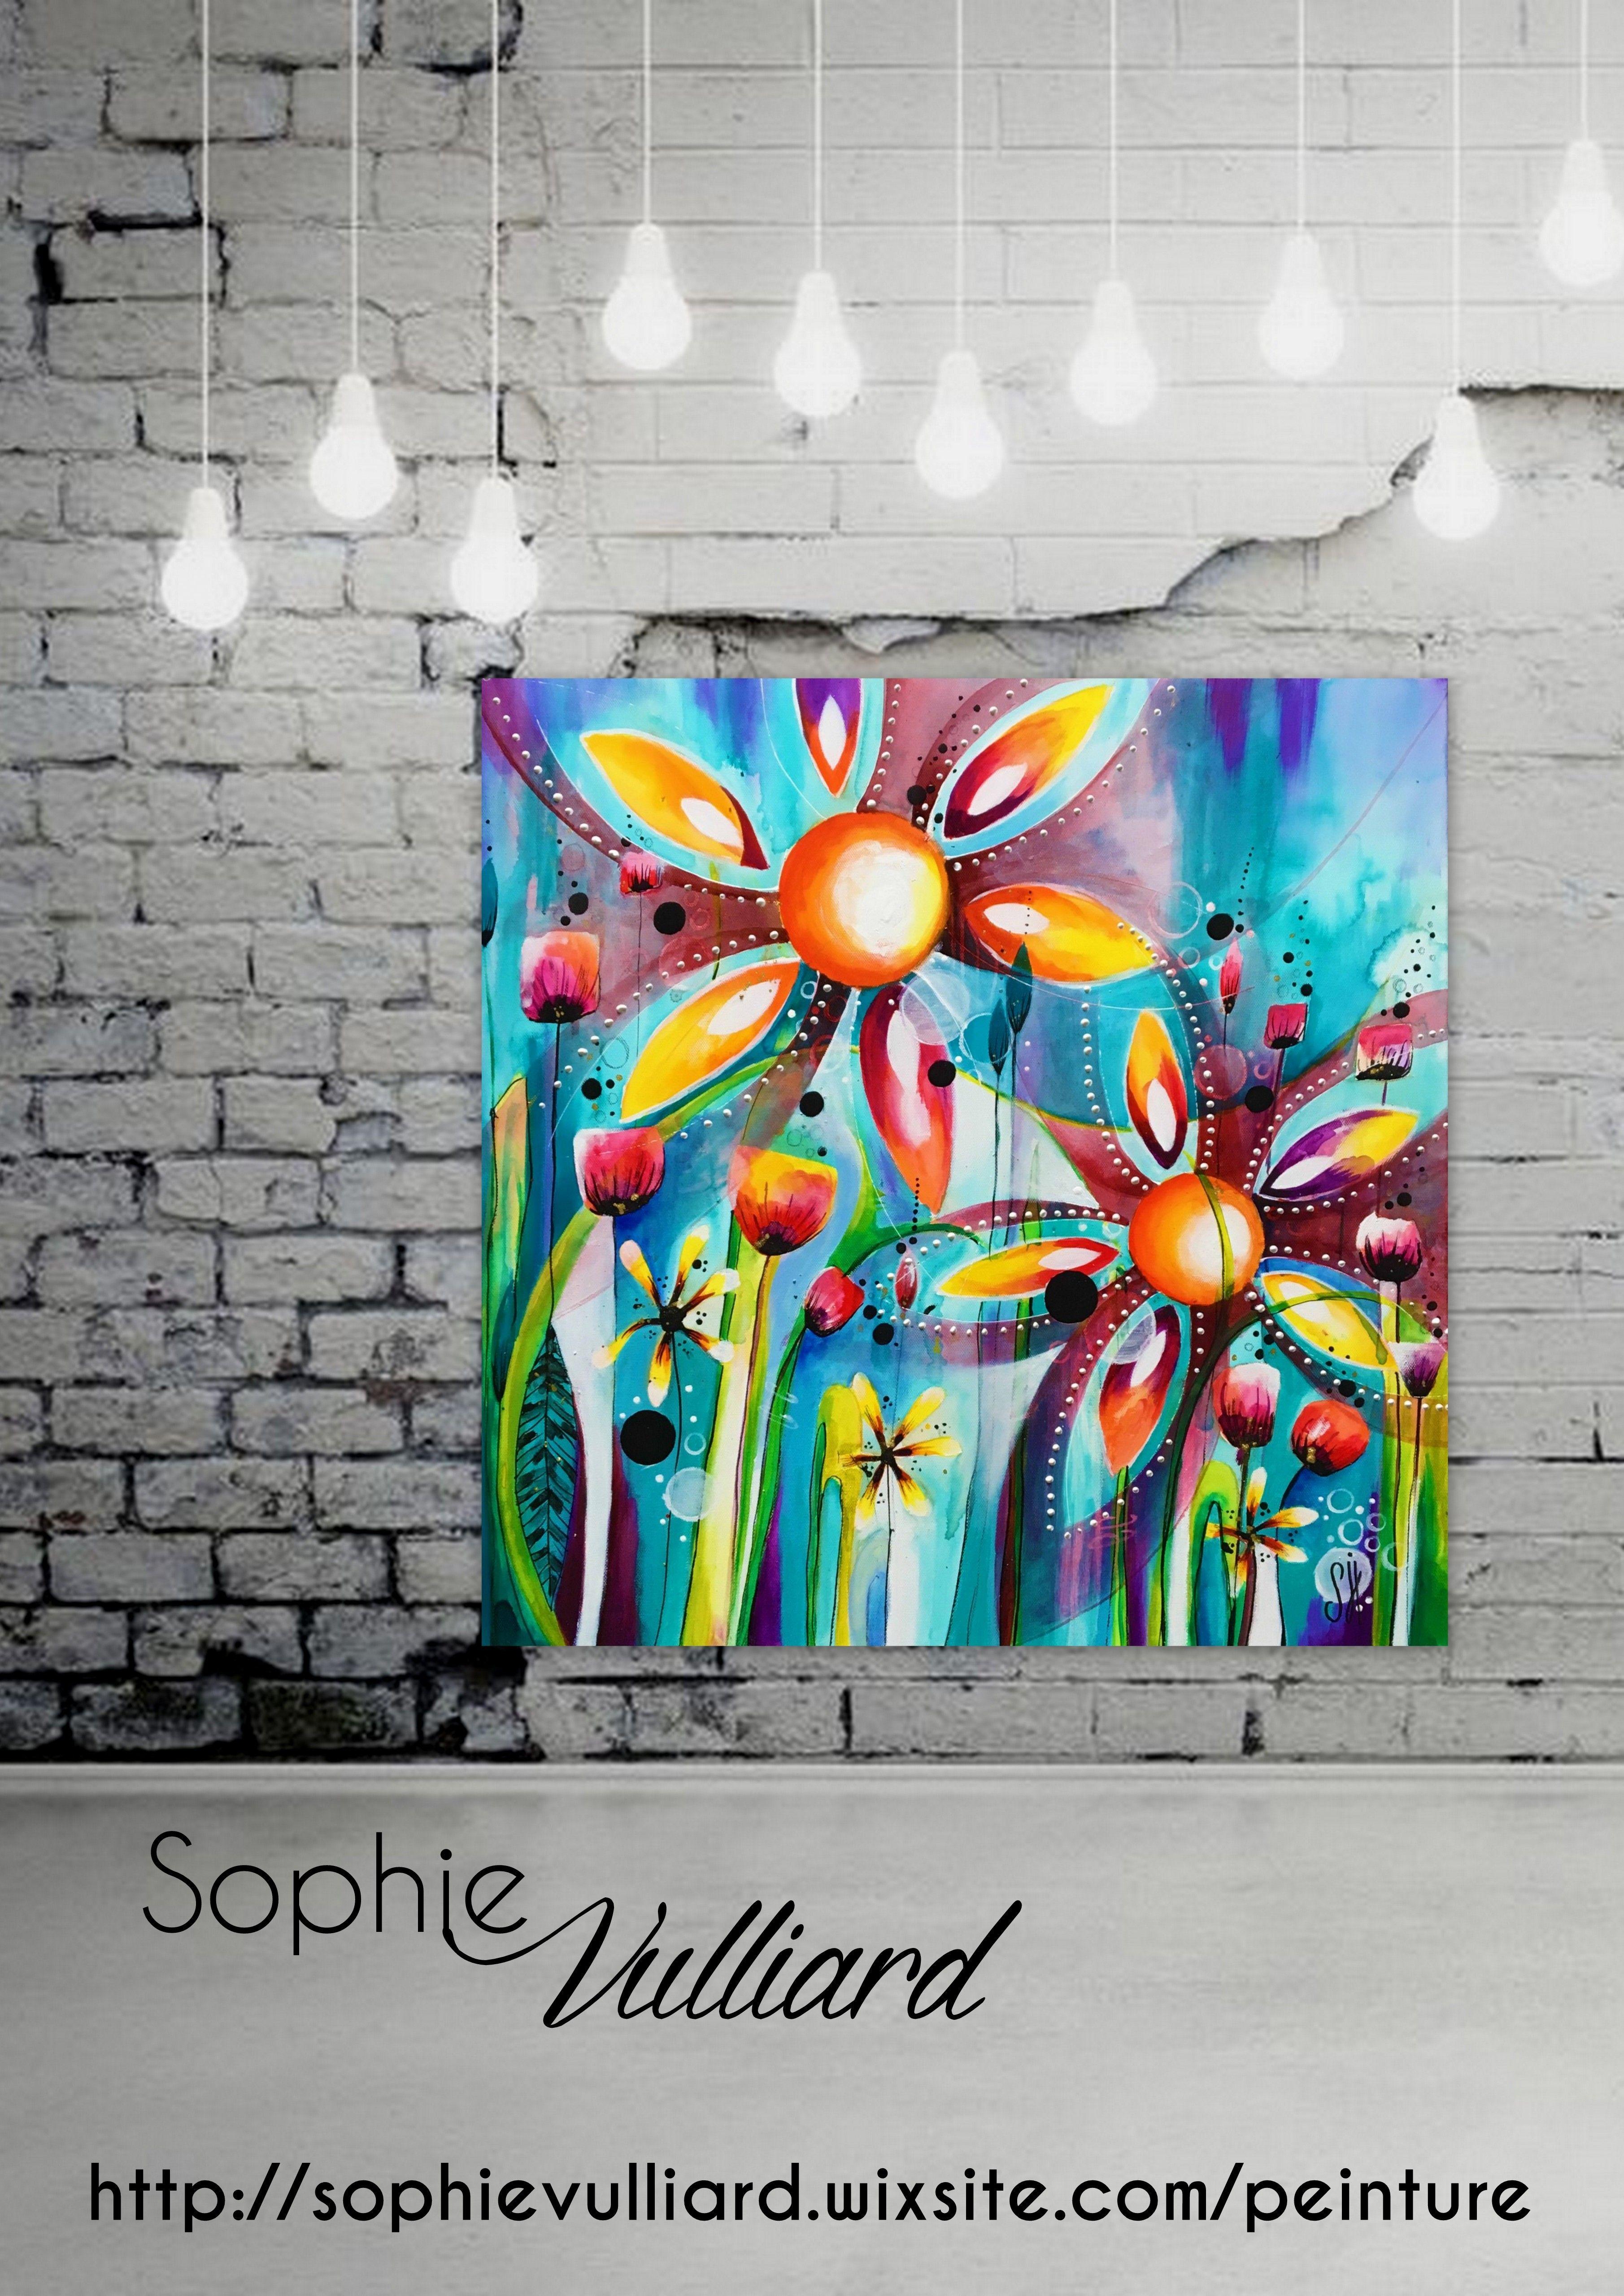 Sophie Vulliard Acrylique Peinture Peinture Spontanee Intuitive